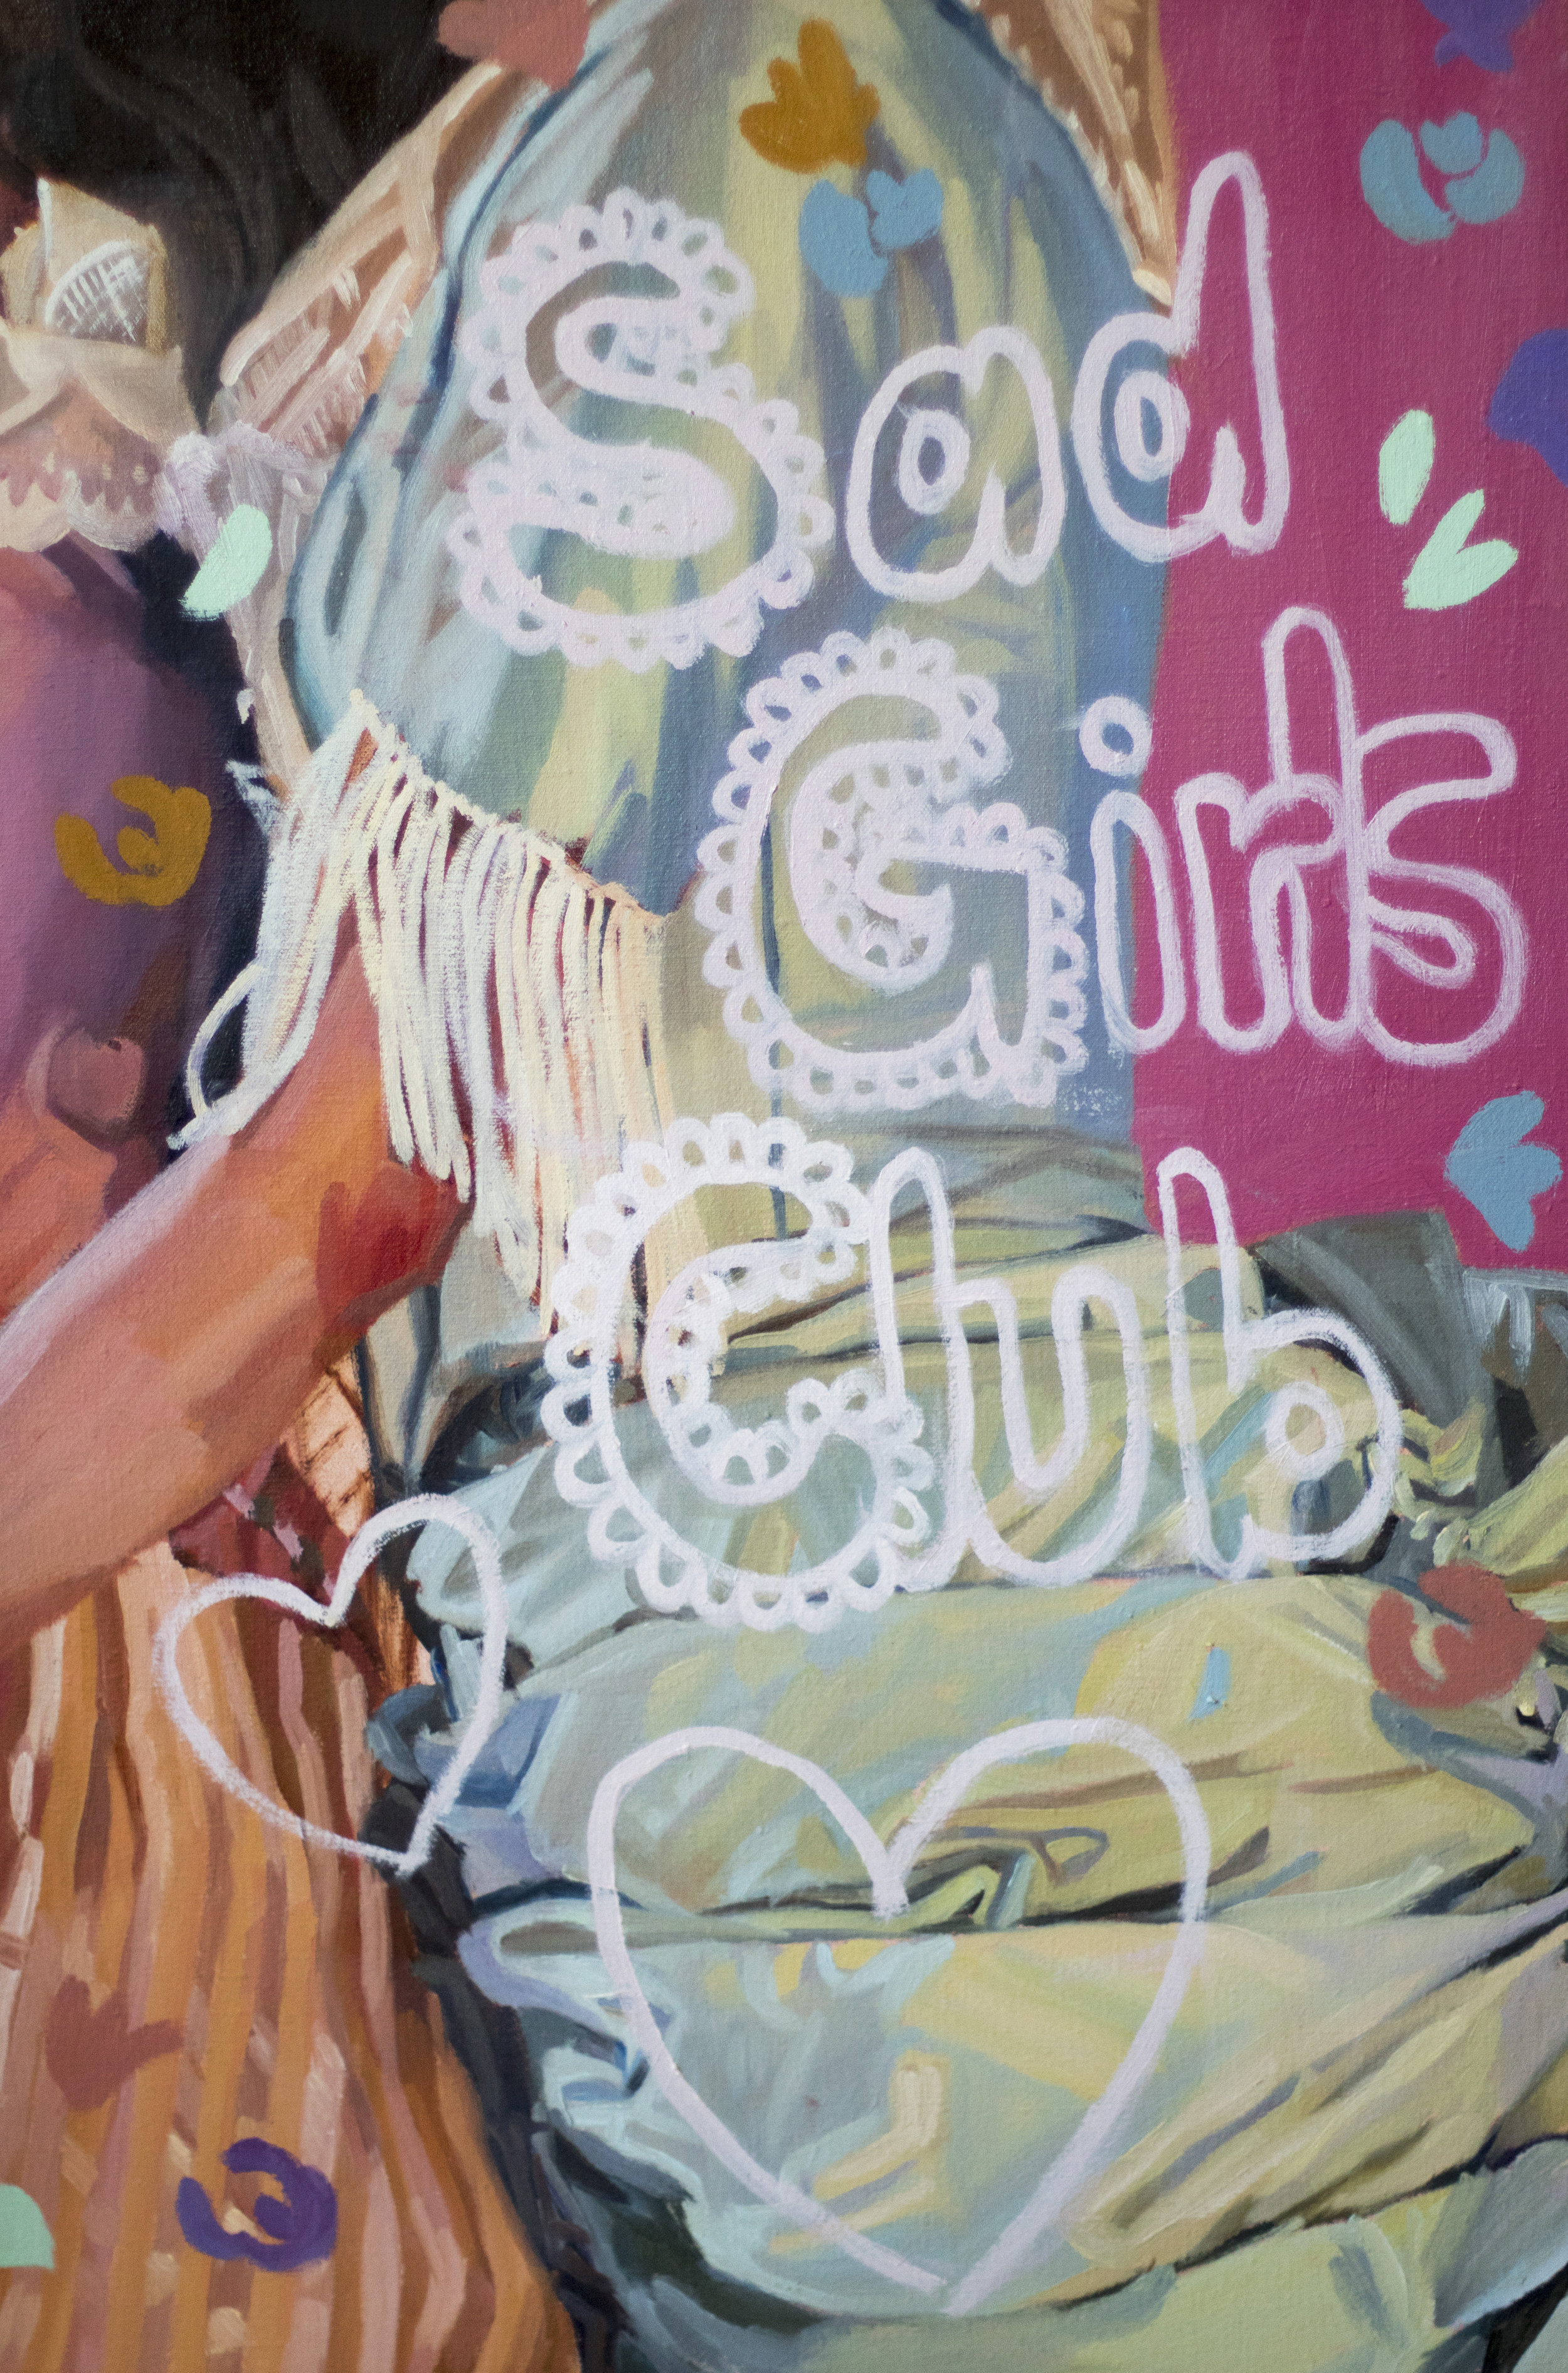 Sad Girls Club detial 2.JPG